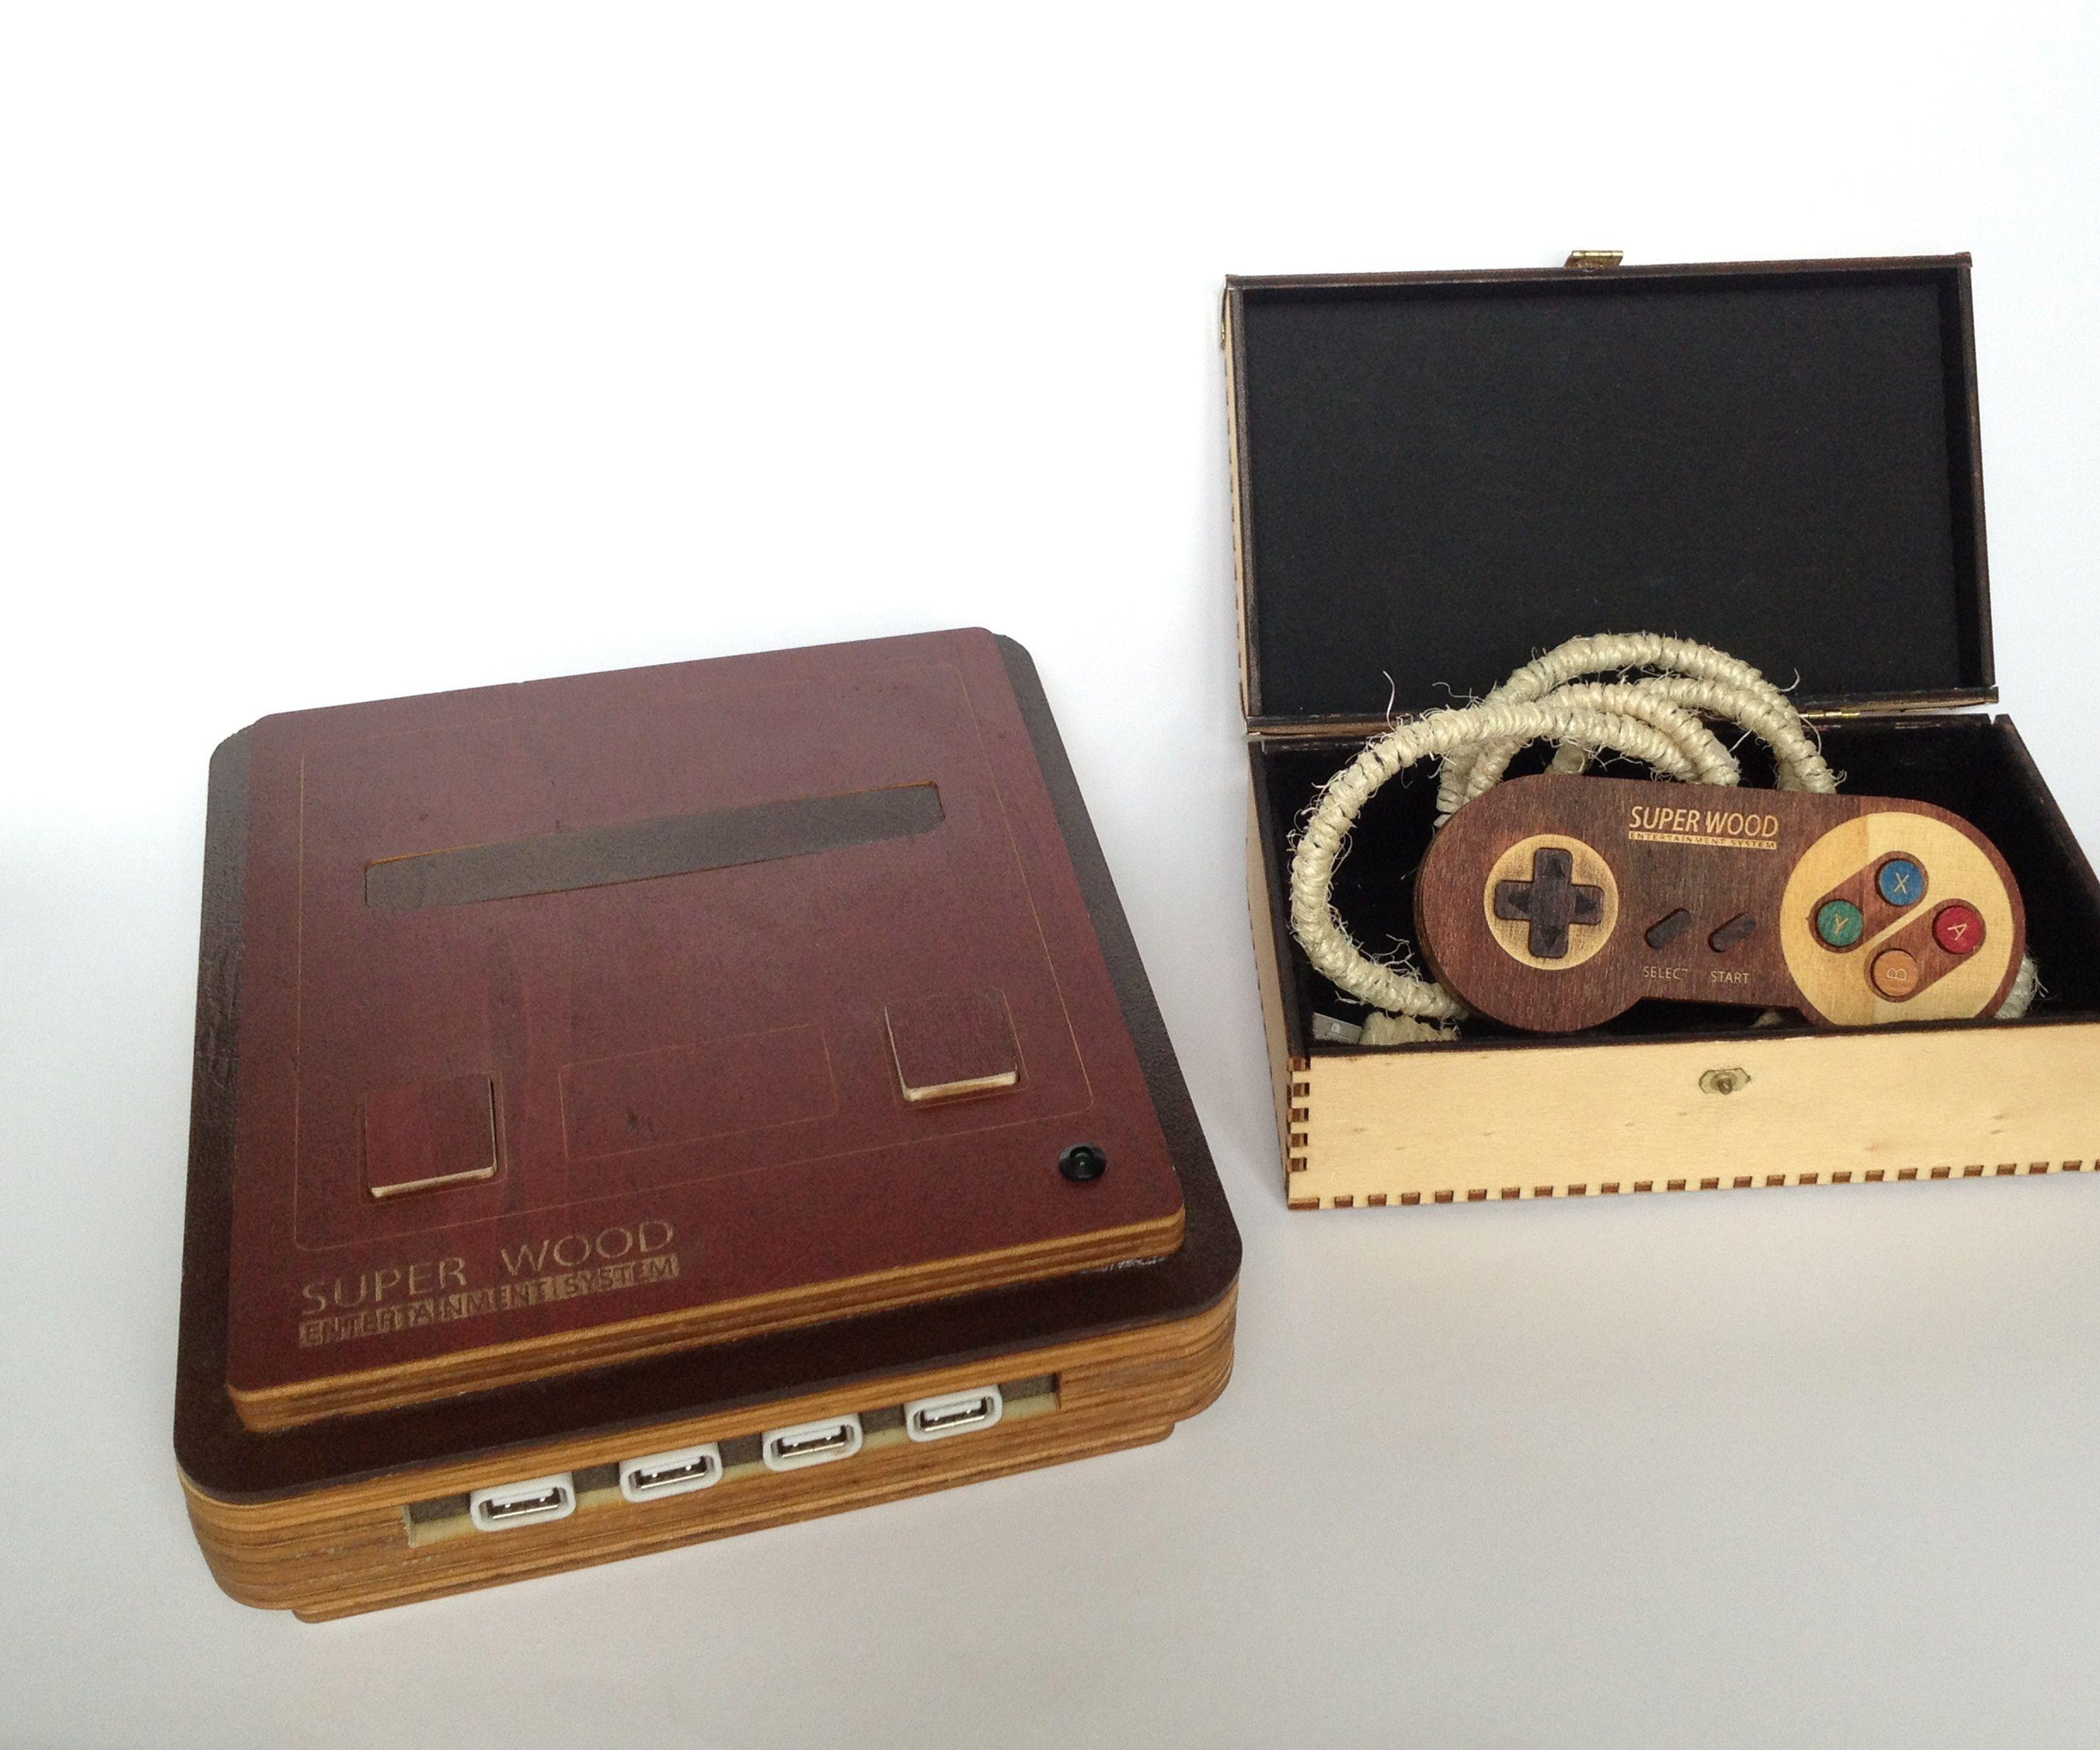 Super Wood Entertainment System